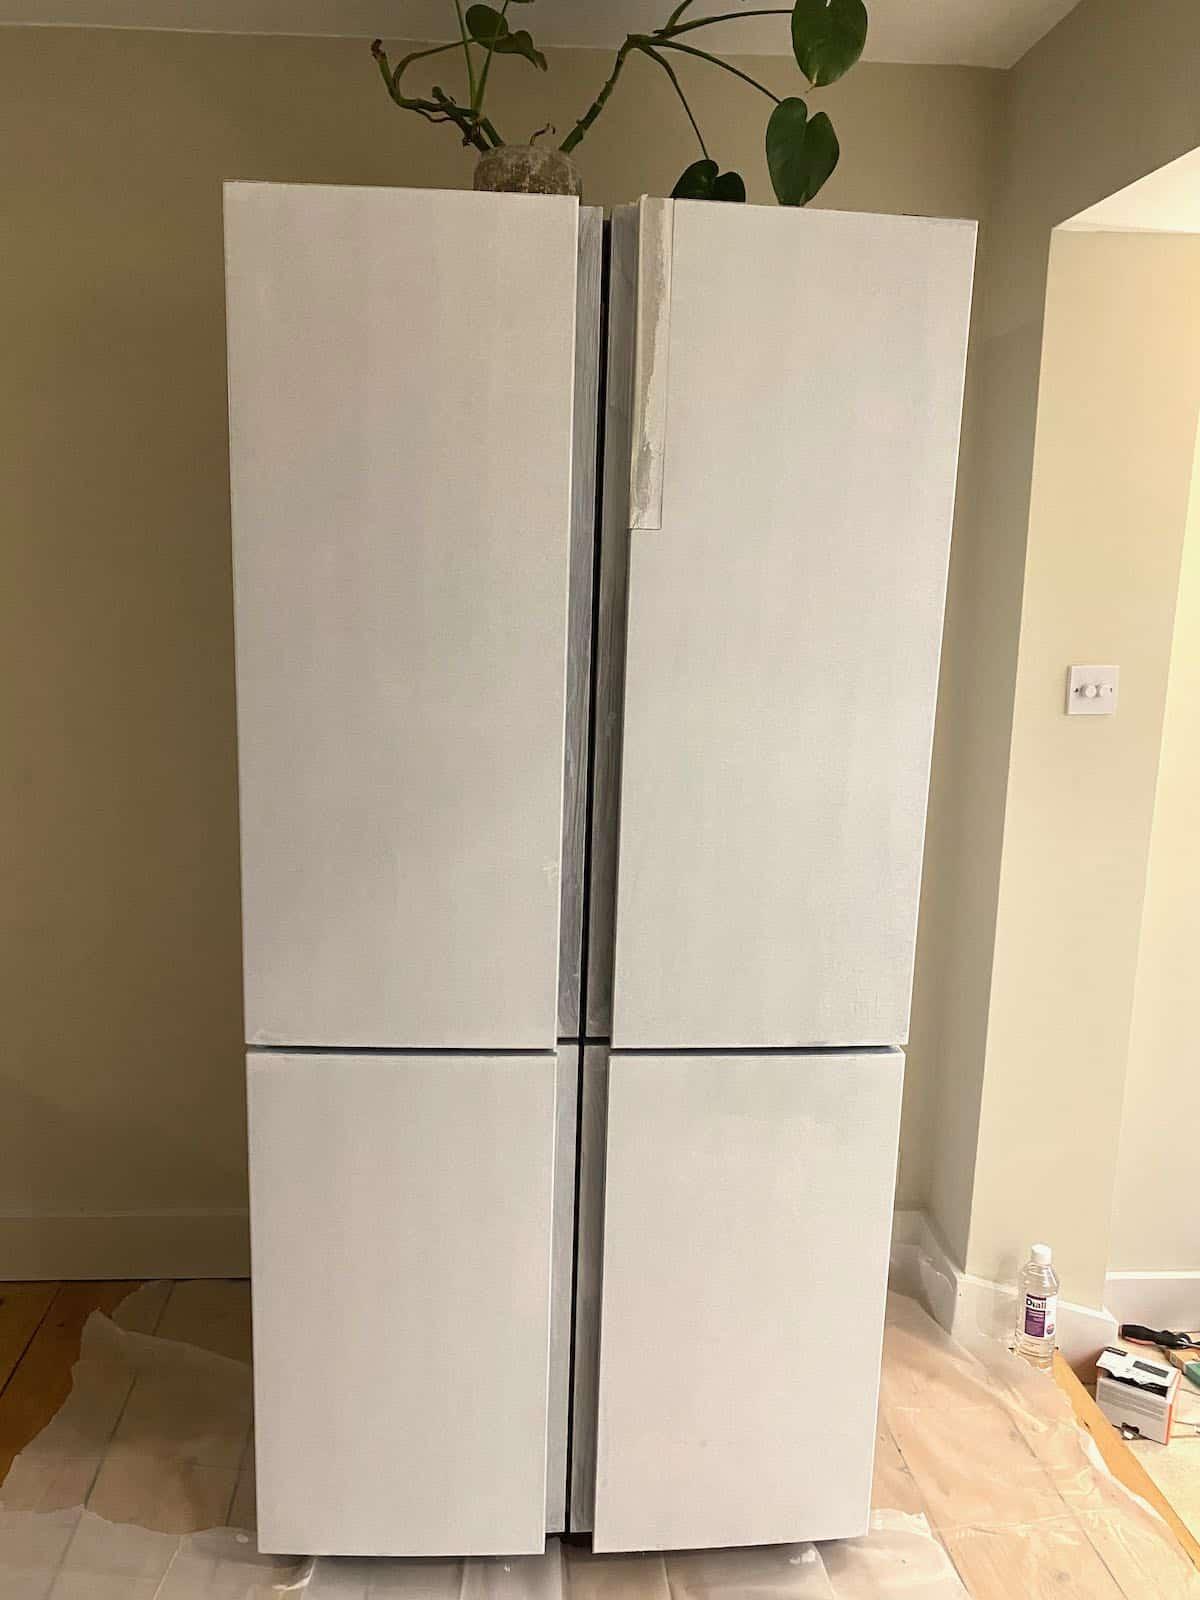 Multi-door fridge freezer painted with primer